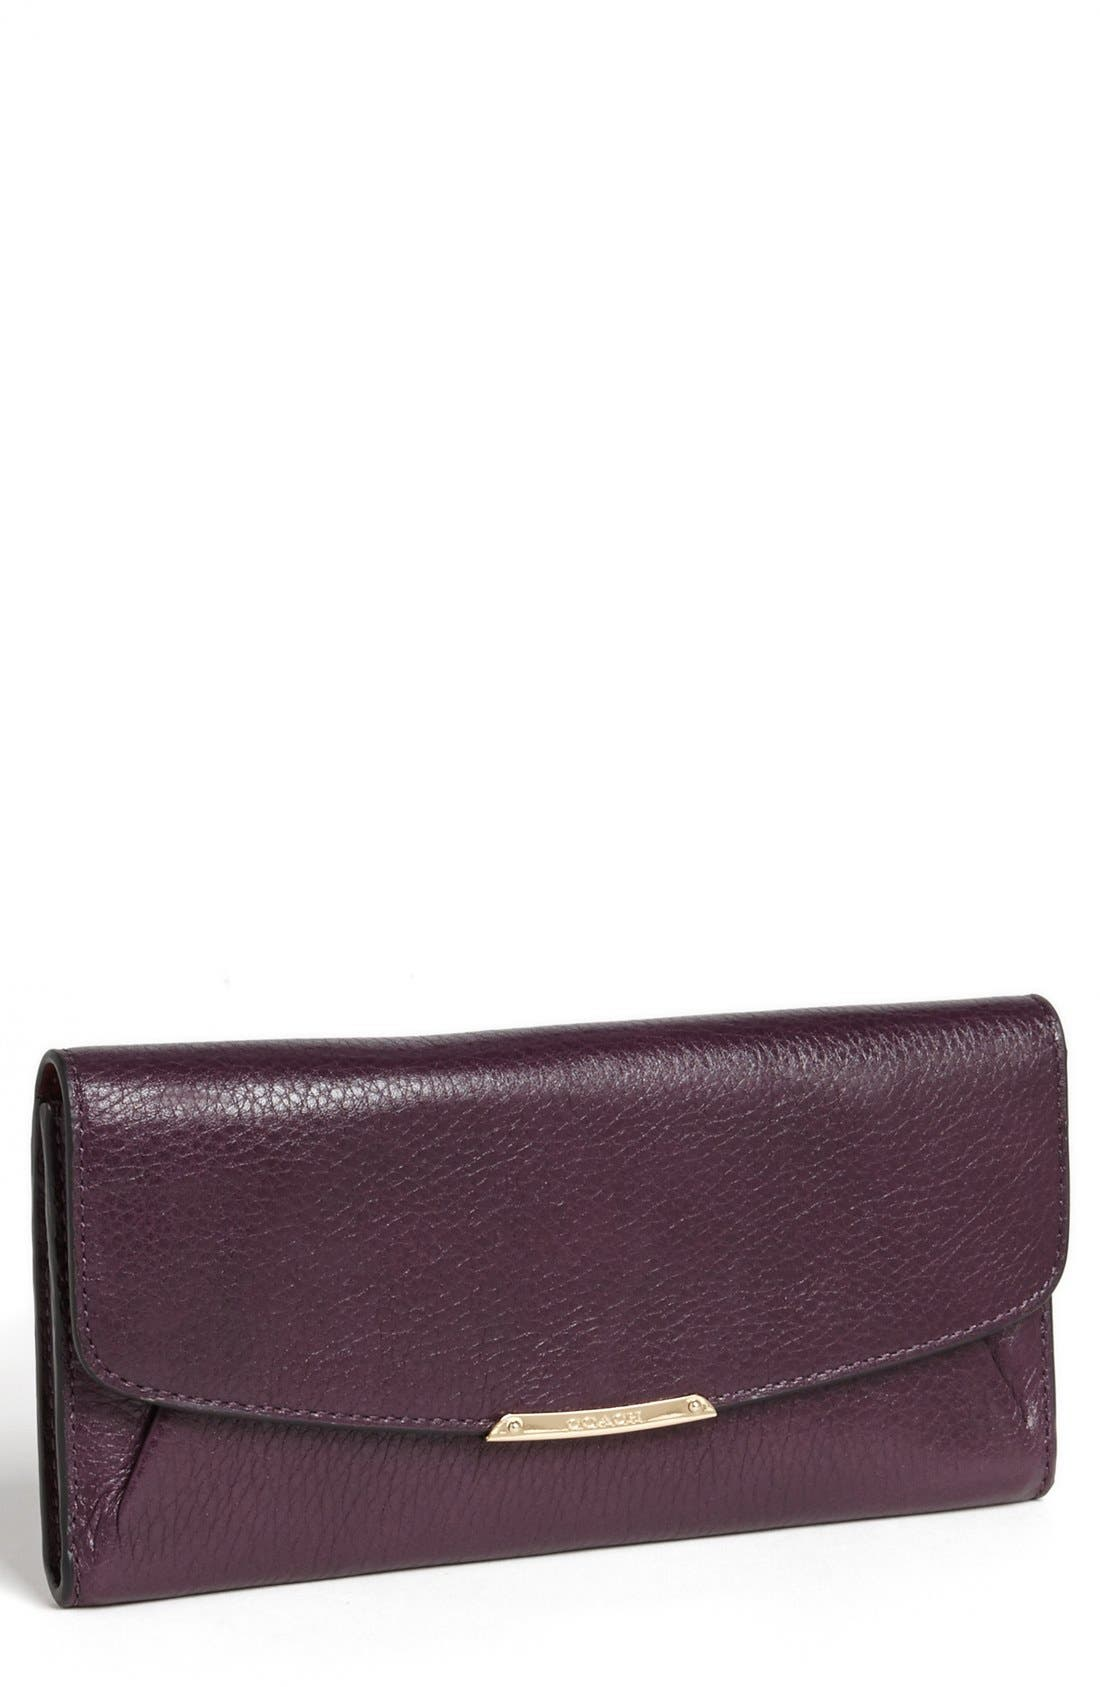 Alternate Image 1 Selected - COACH 'Madison' Leather Envelope Wallet